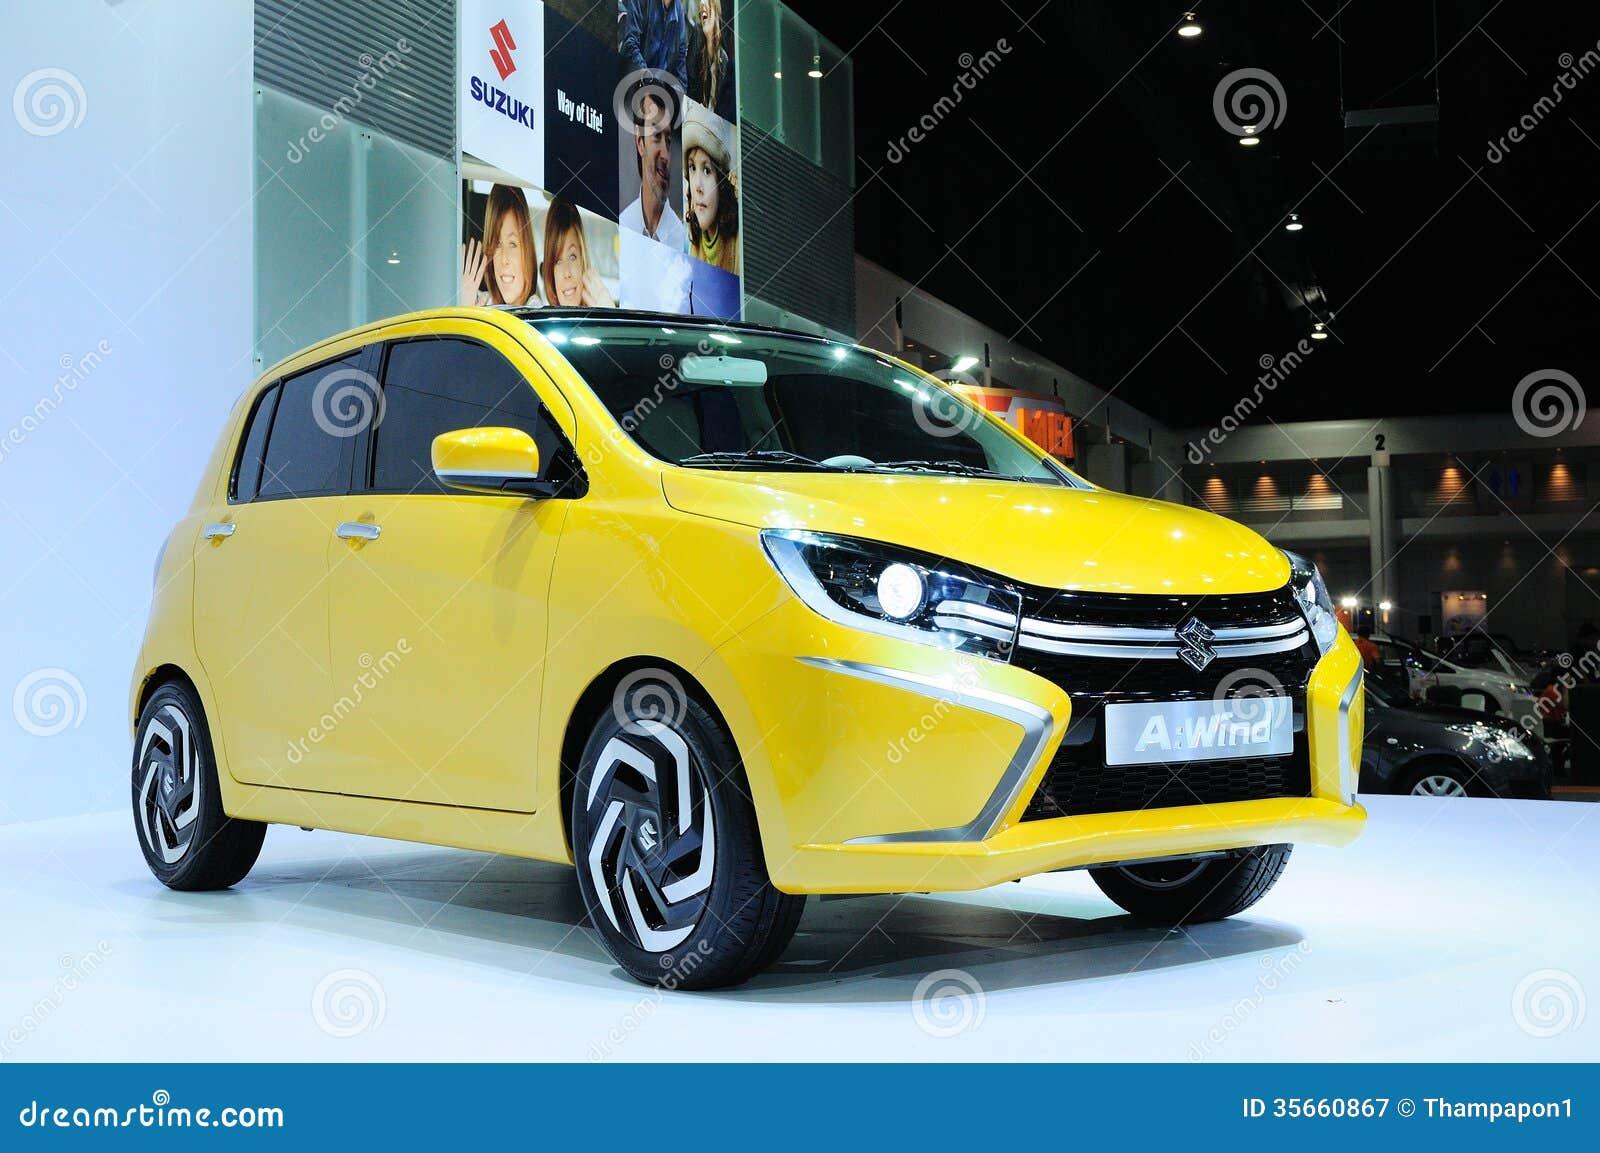 Bkk Nov 28 Suzuki A Wind Eco Concept Car On Display At Thai